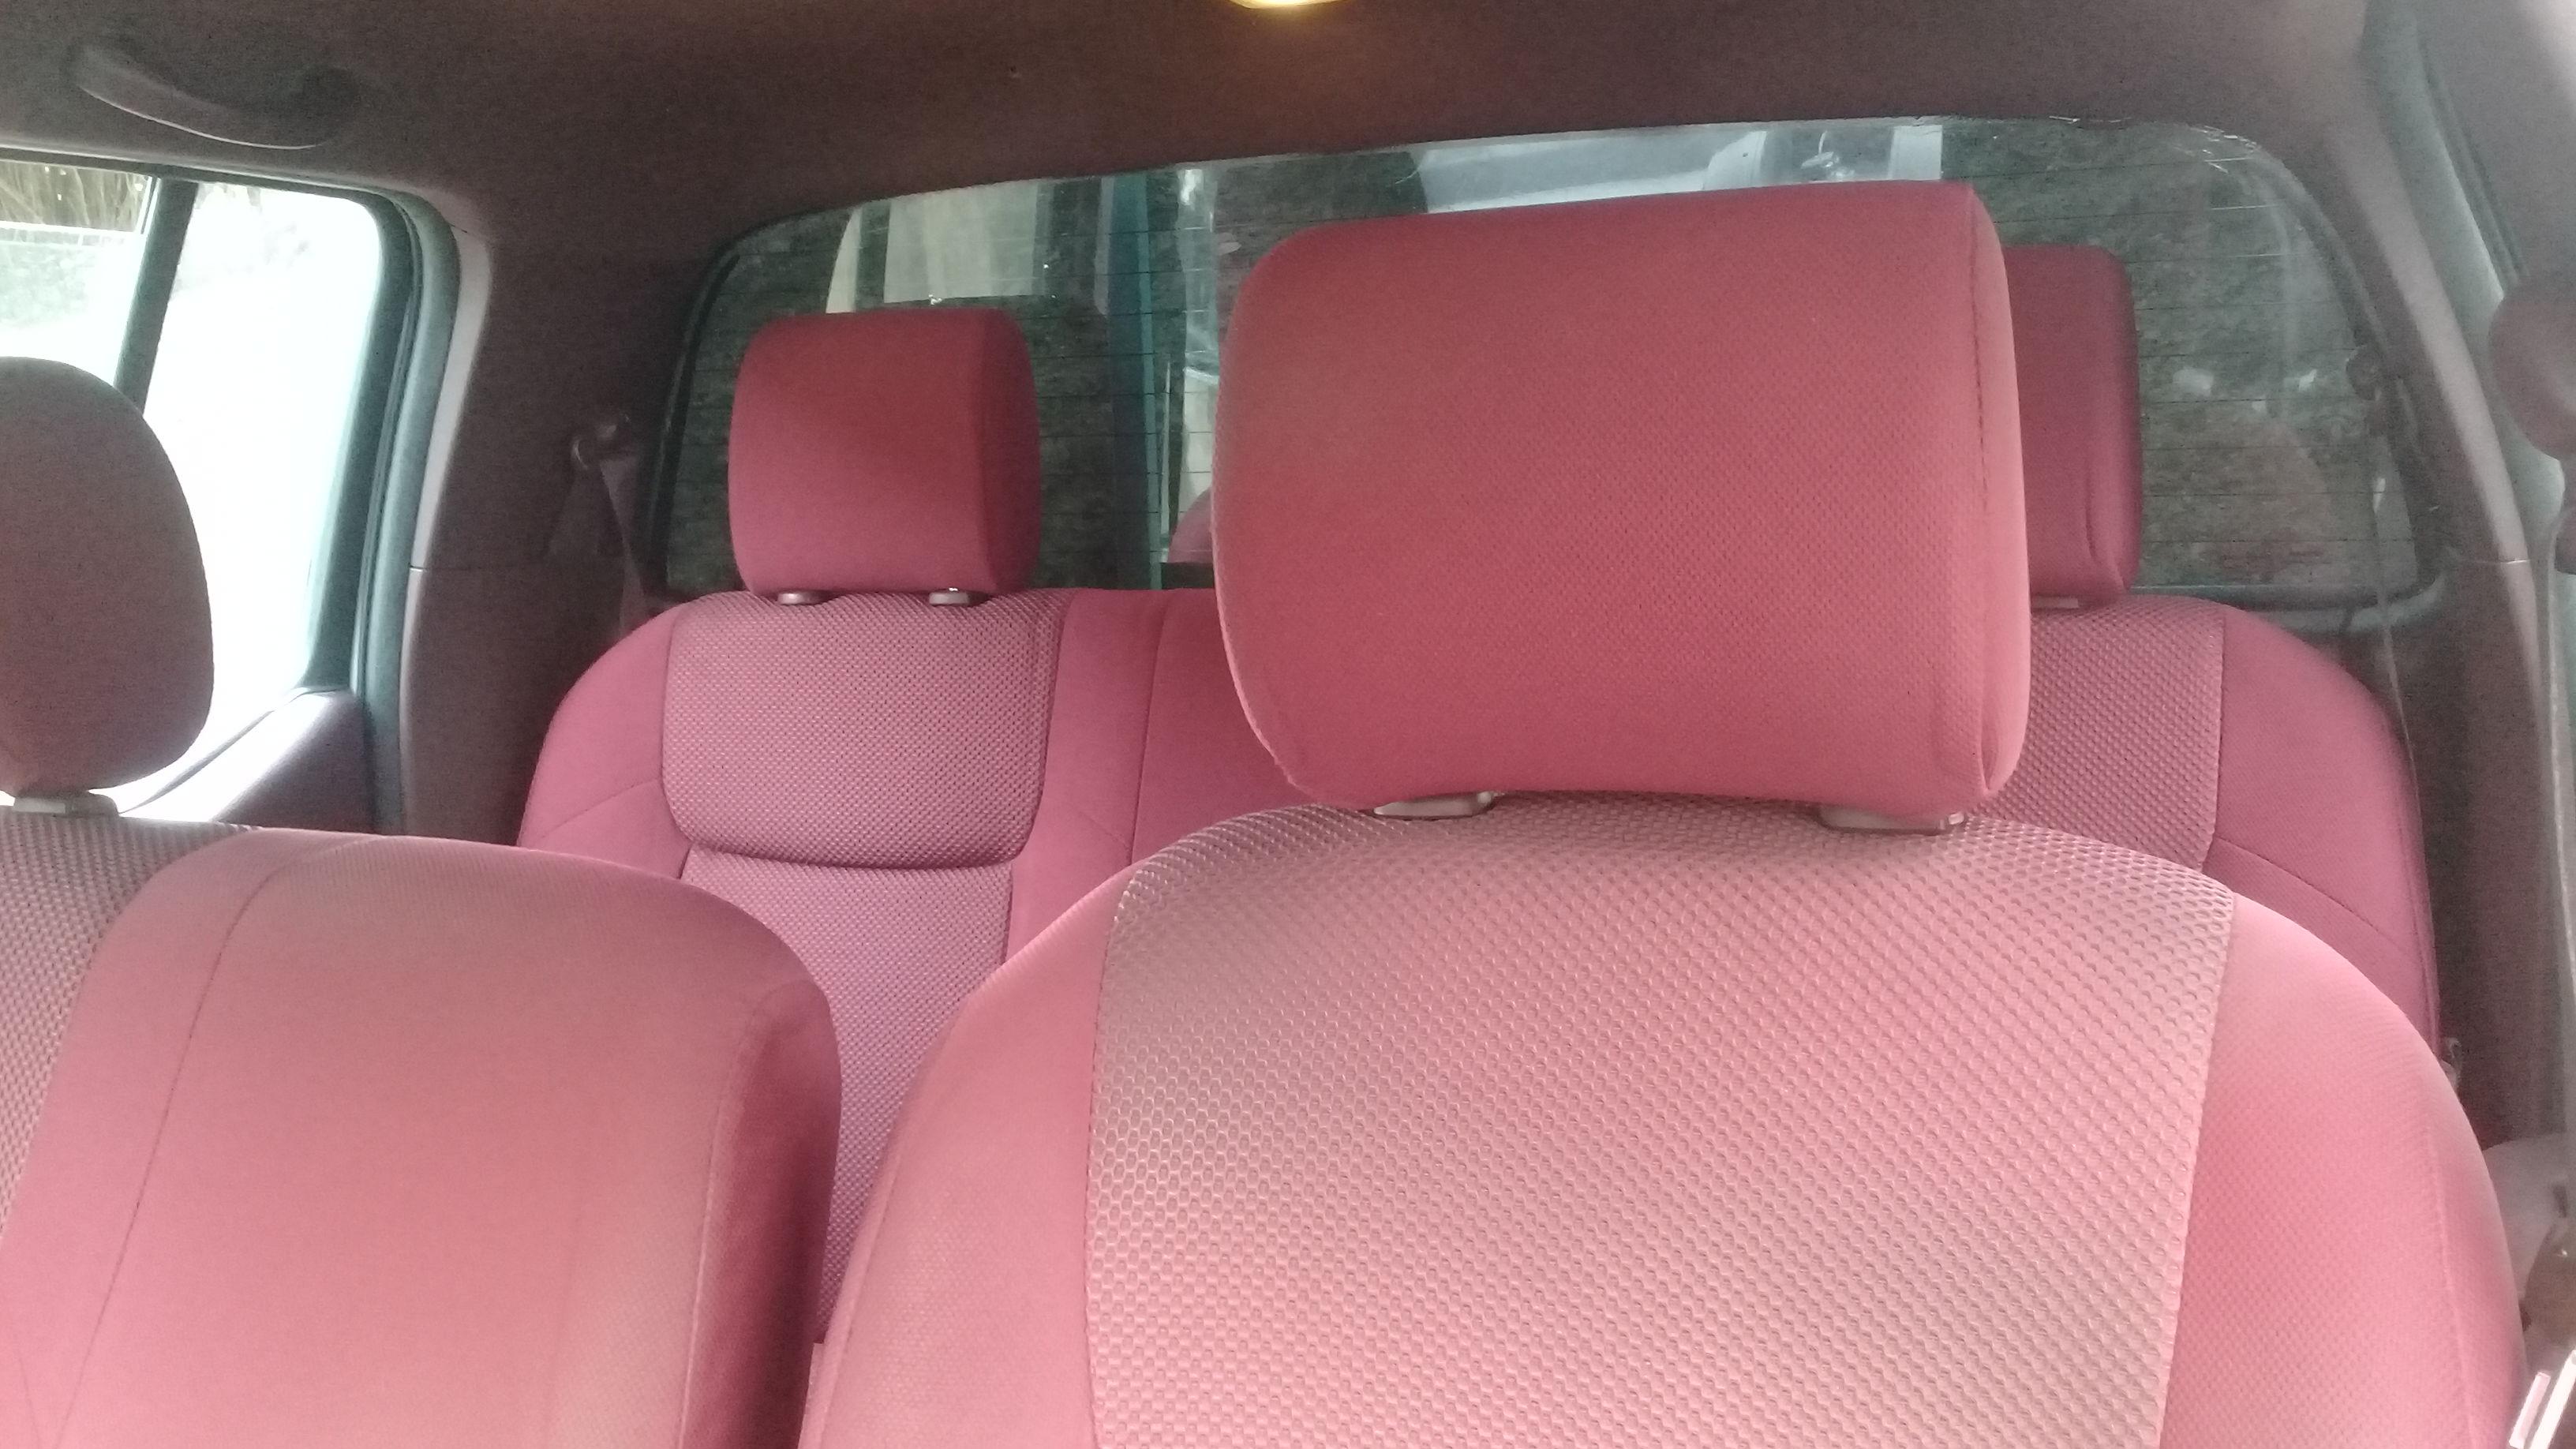 Nissan Navara 2.5(lt) 2012 Подержанный  $13000